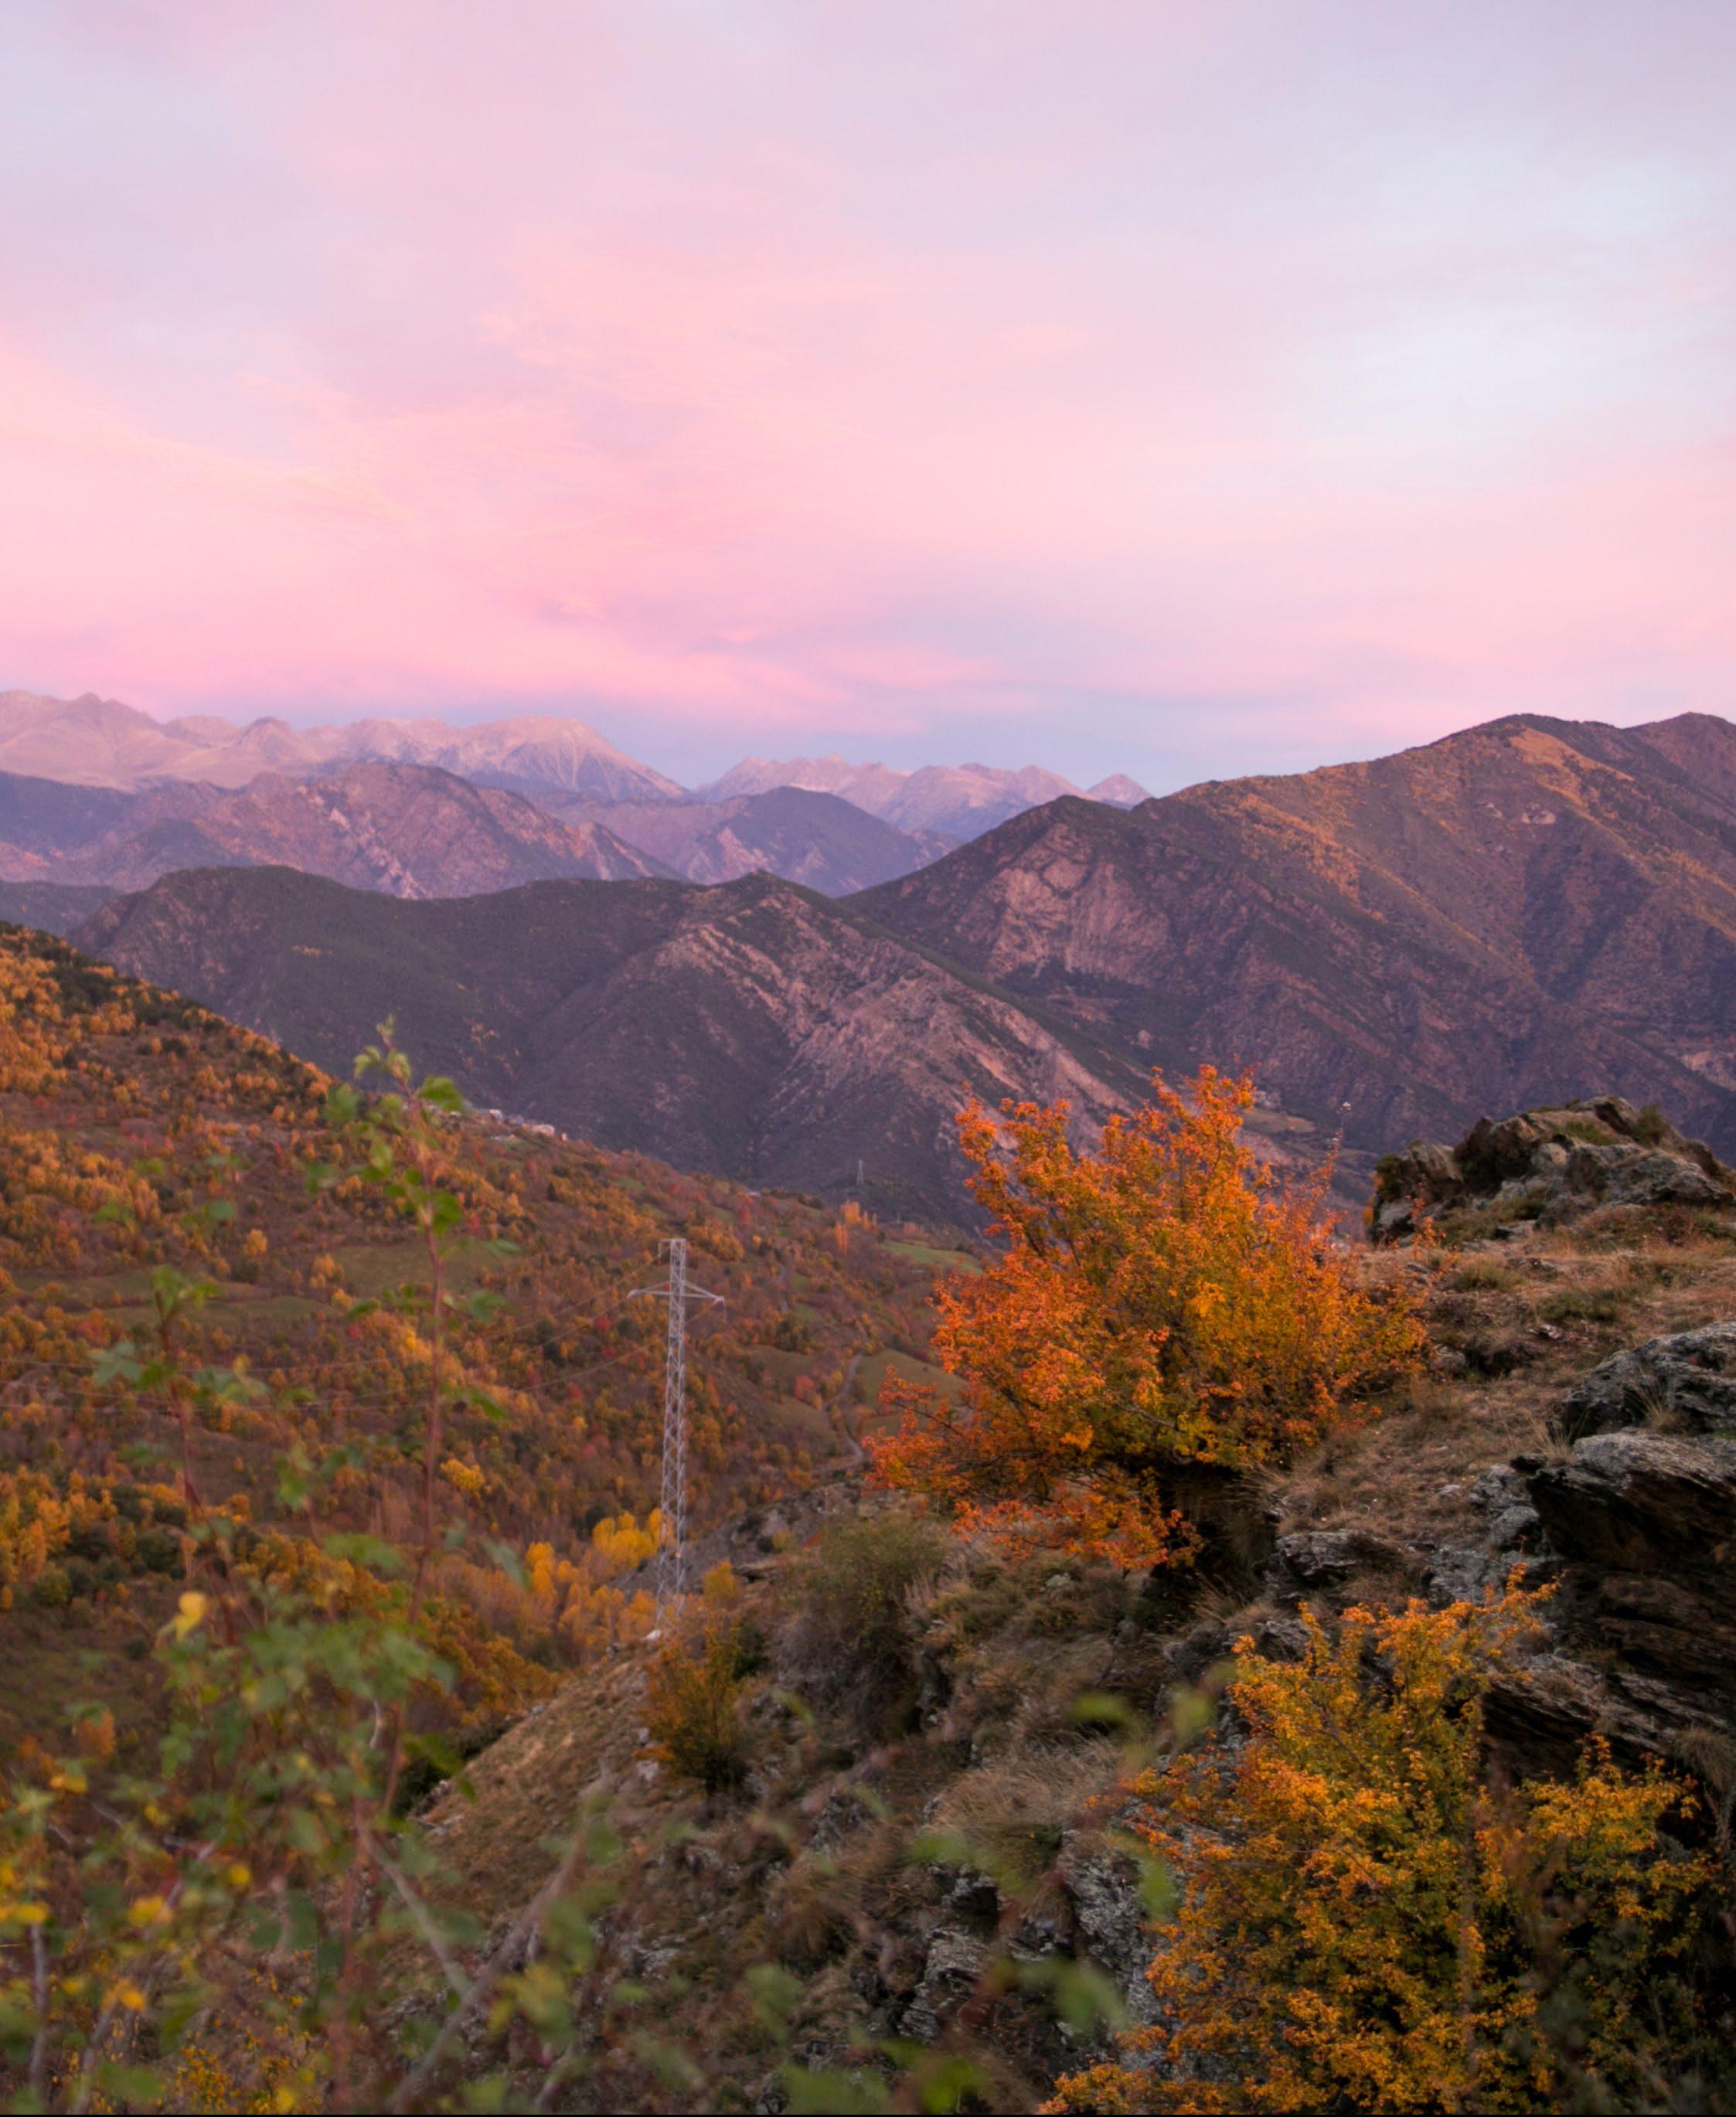 Retiro fotográfico Pirineos. Taller de fotografía